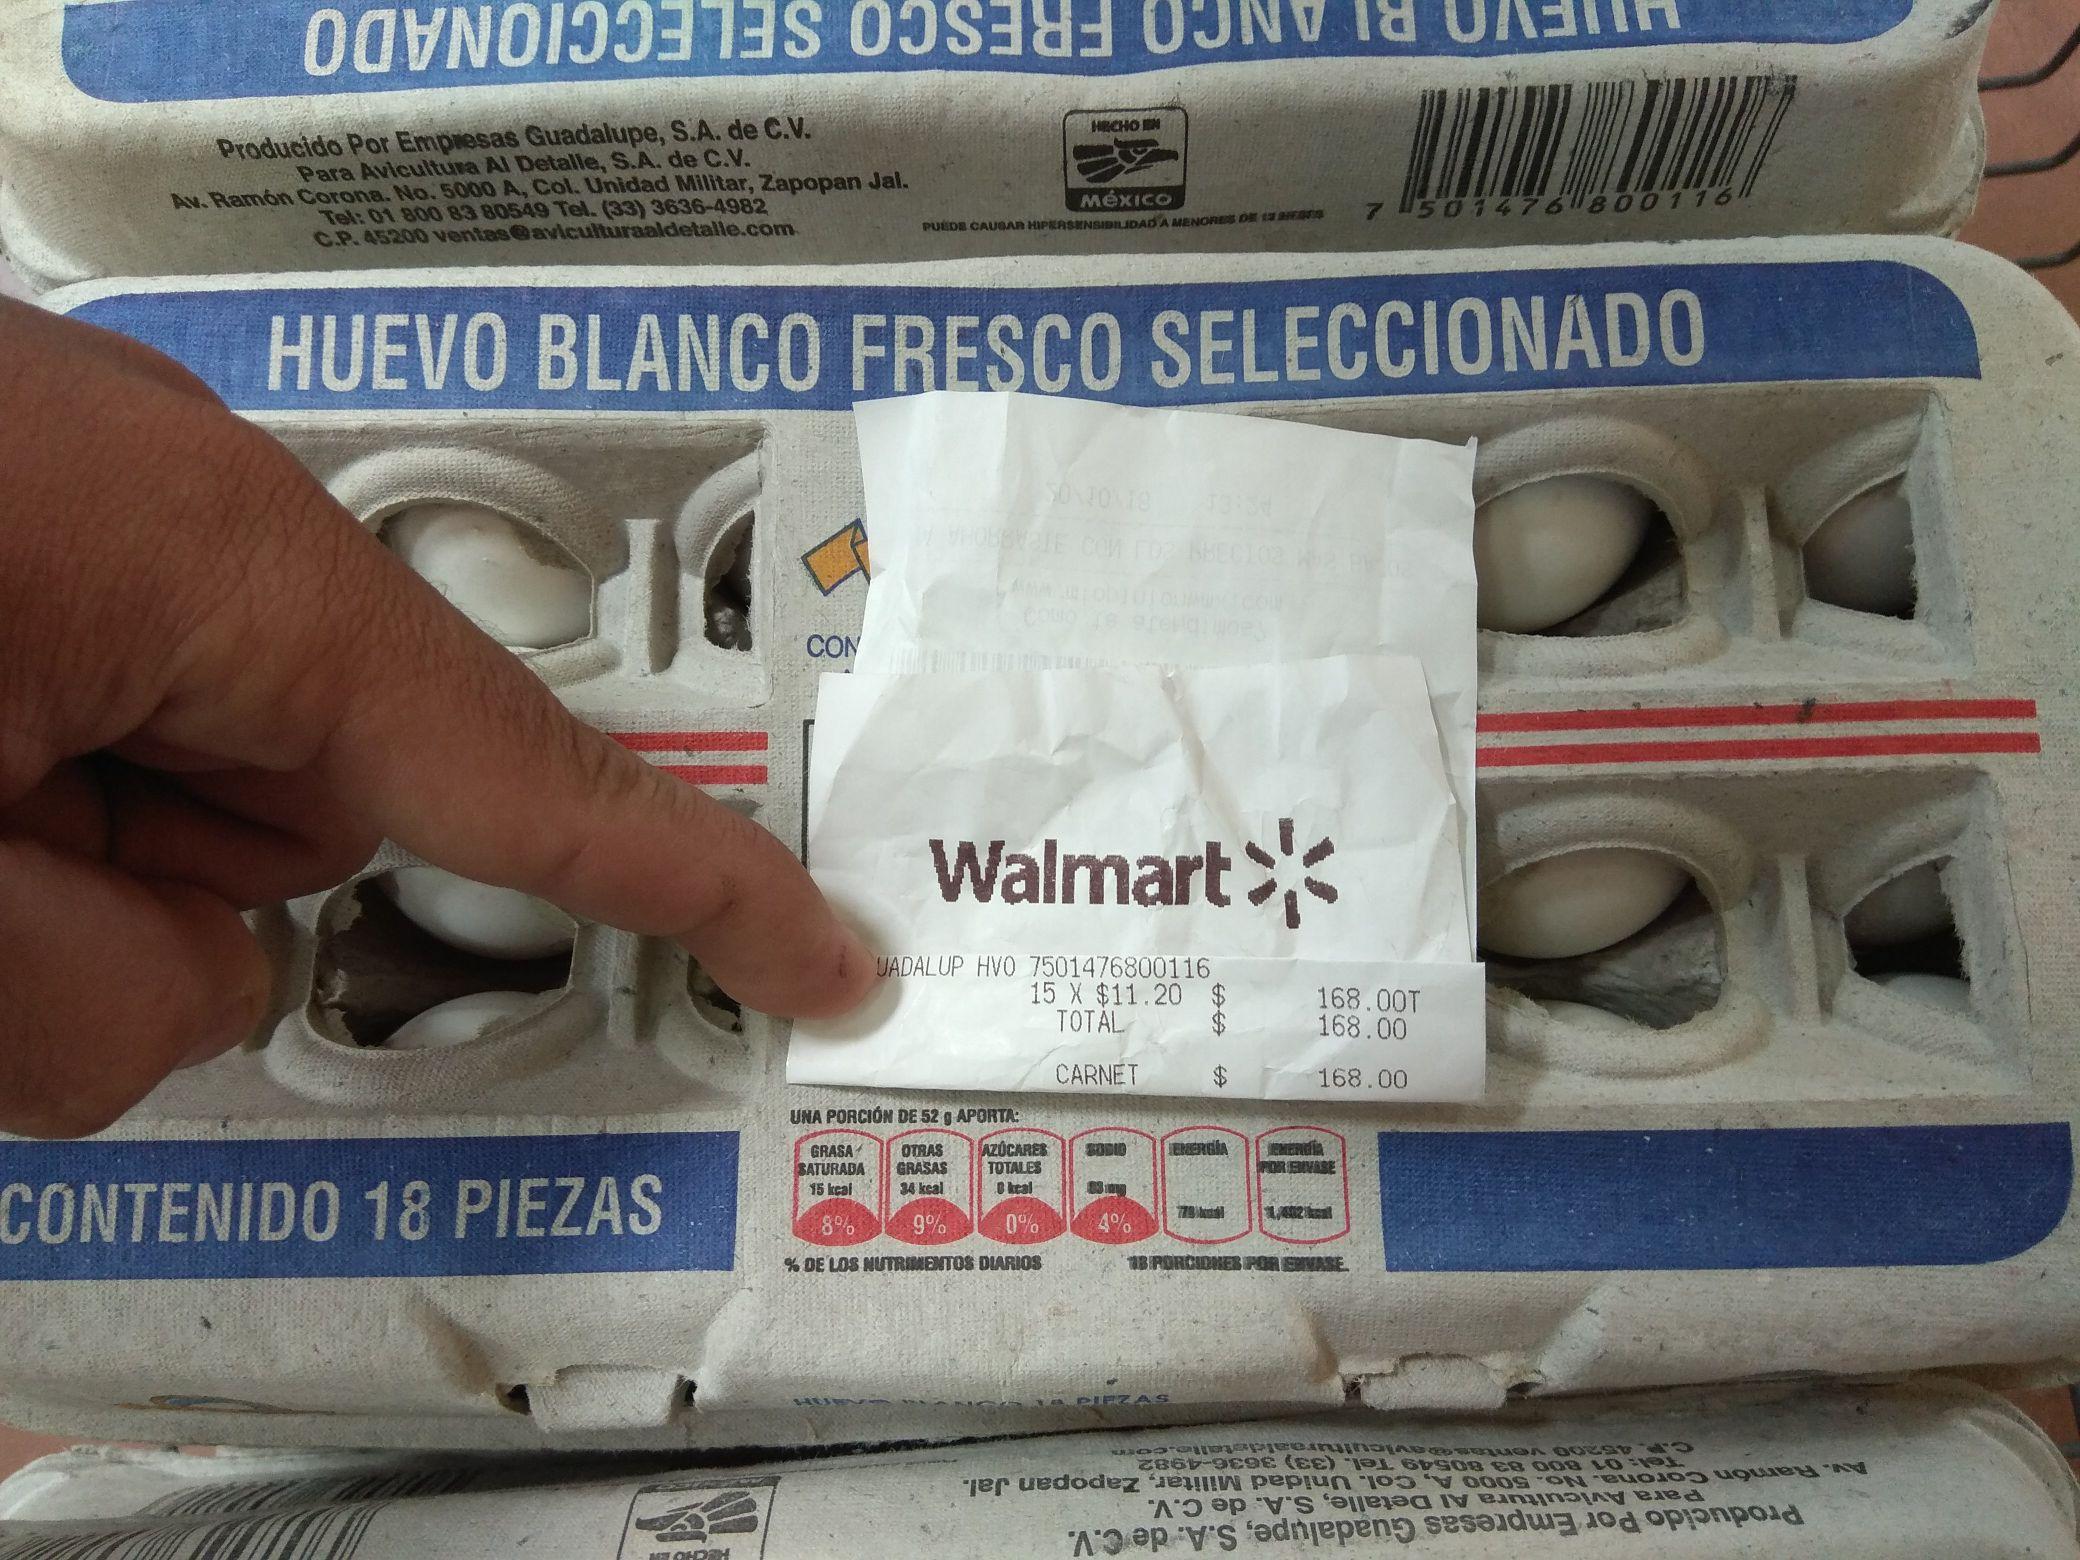 Walmart: 18 pz Huevo blanco Guadalupe a 11.20